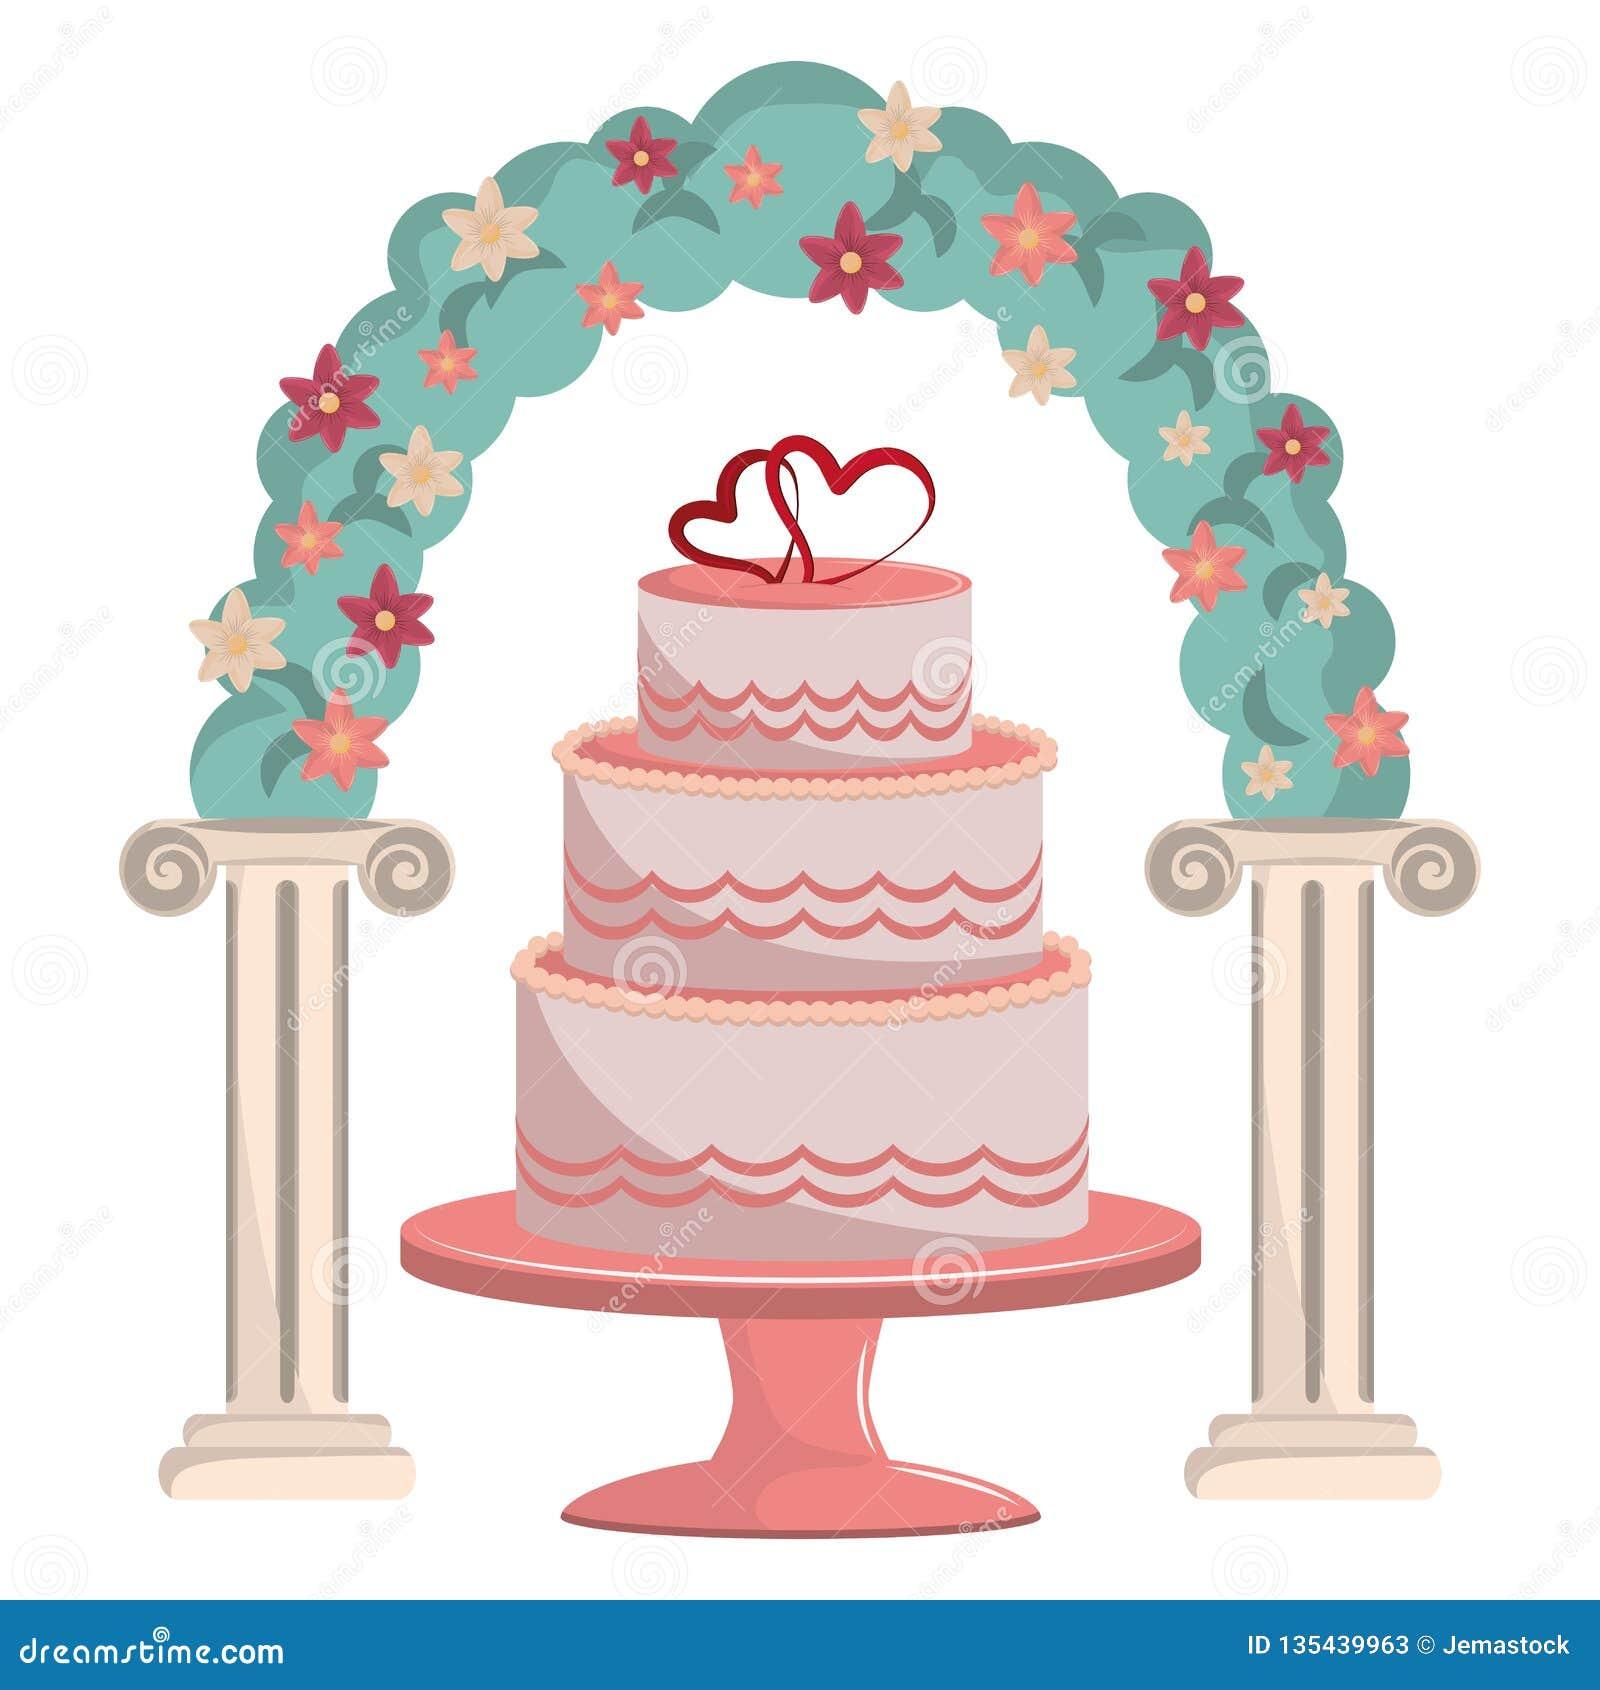 Wedding Celebration Cartoons Stock Vector Illustration Of Drawing